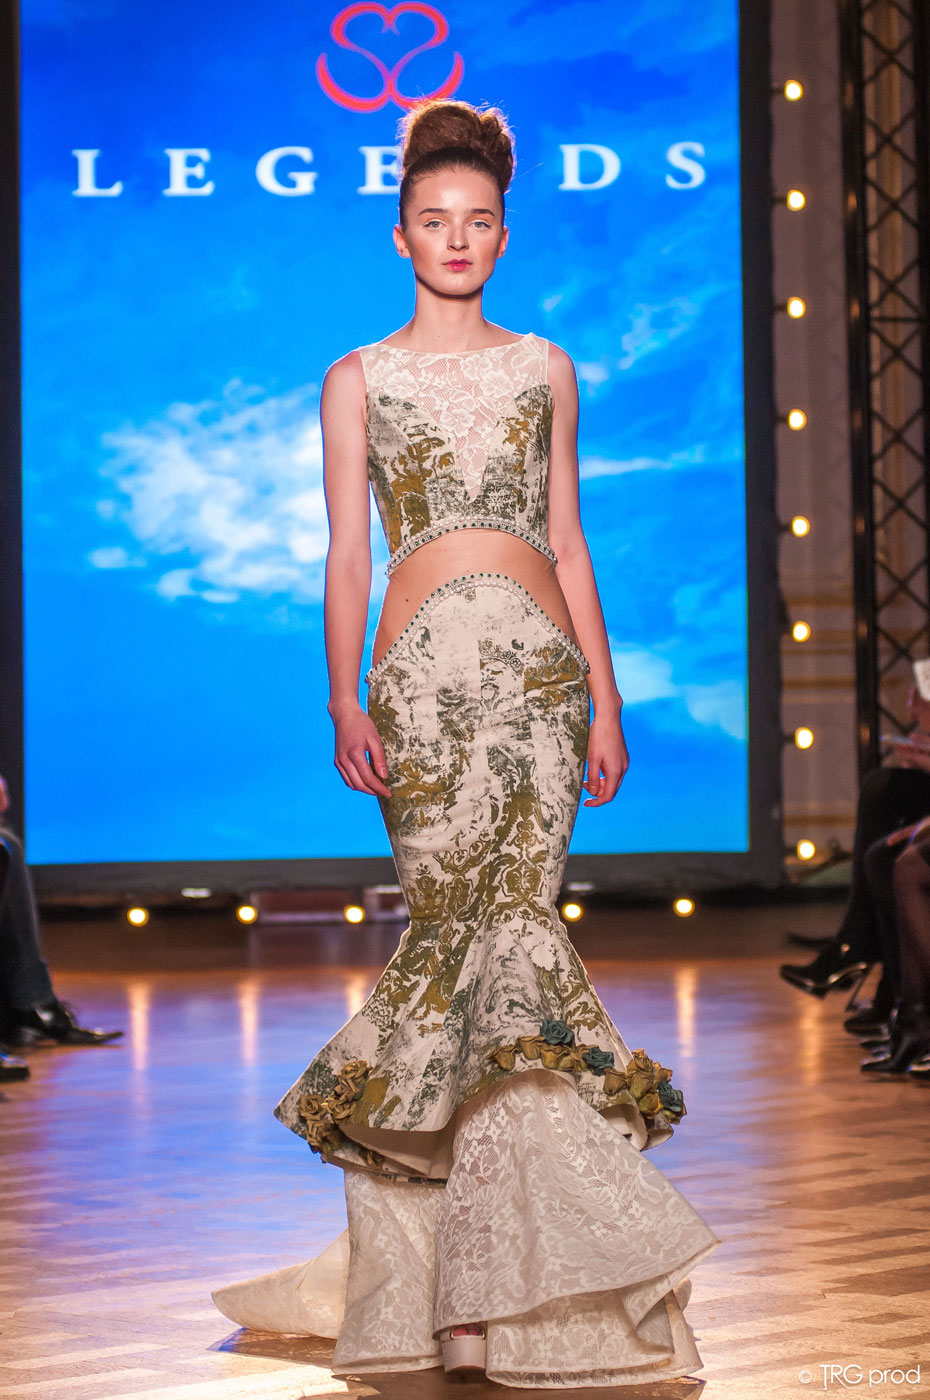 Legends-fashion-runway-show-haute-couture-paris-spring-2015-the-impression-09